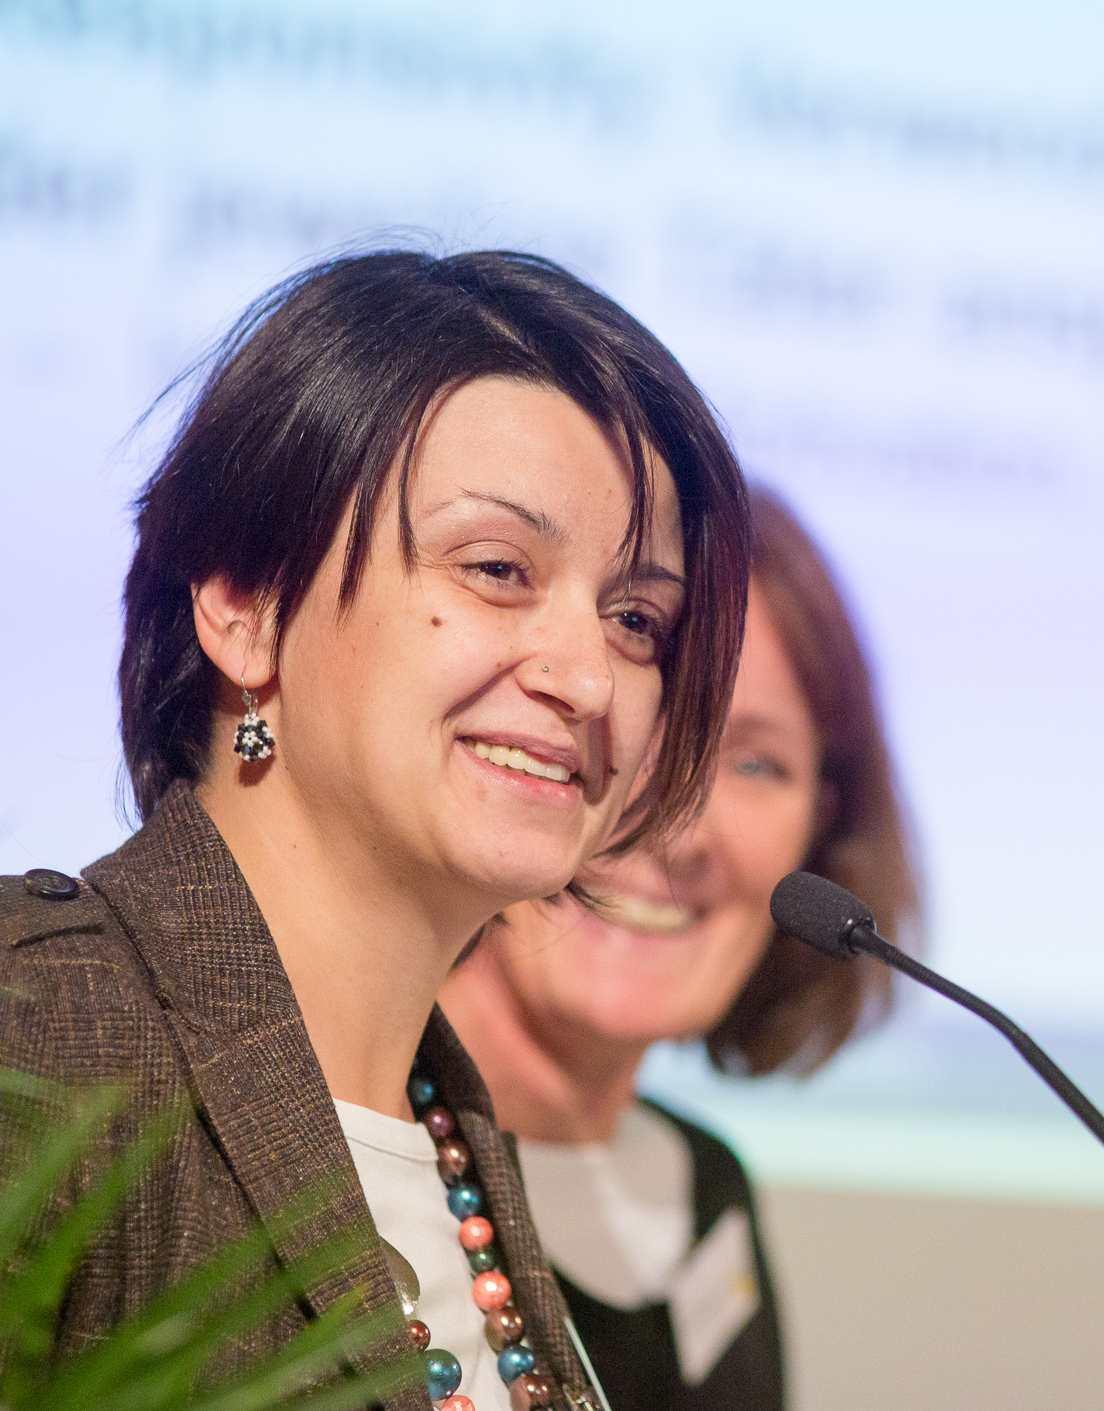 Katrin Heubach Vaya Emmanouil